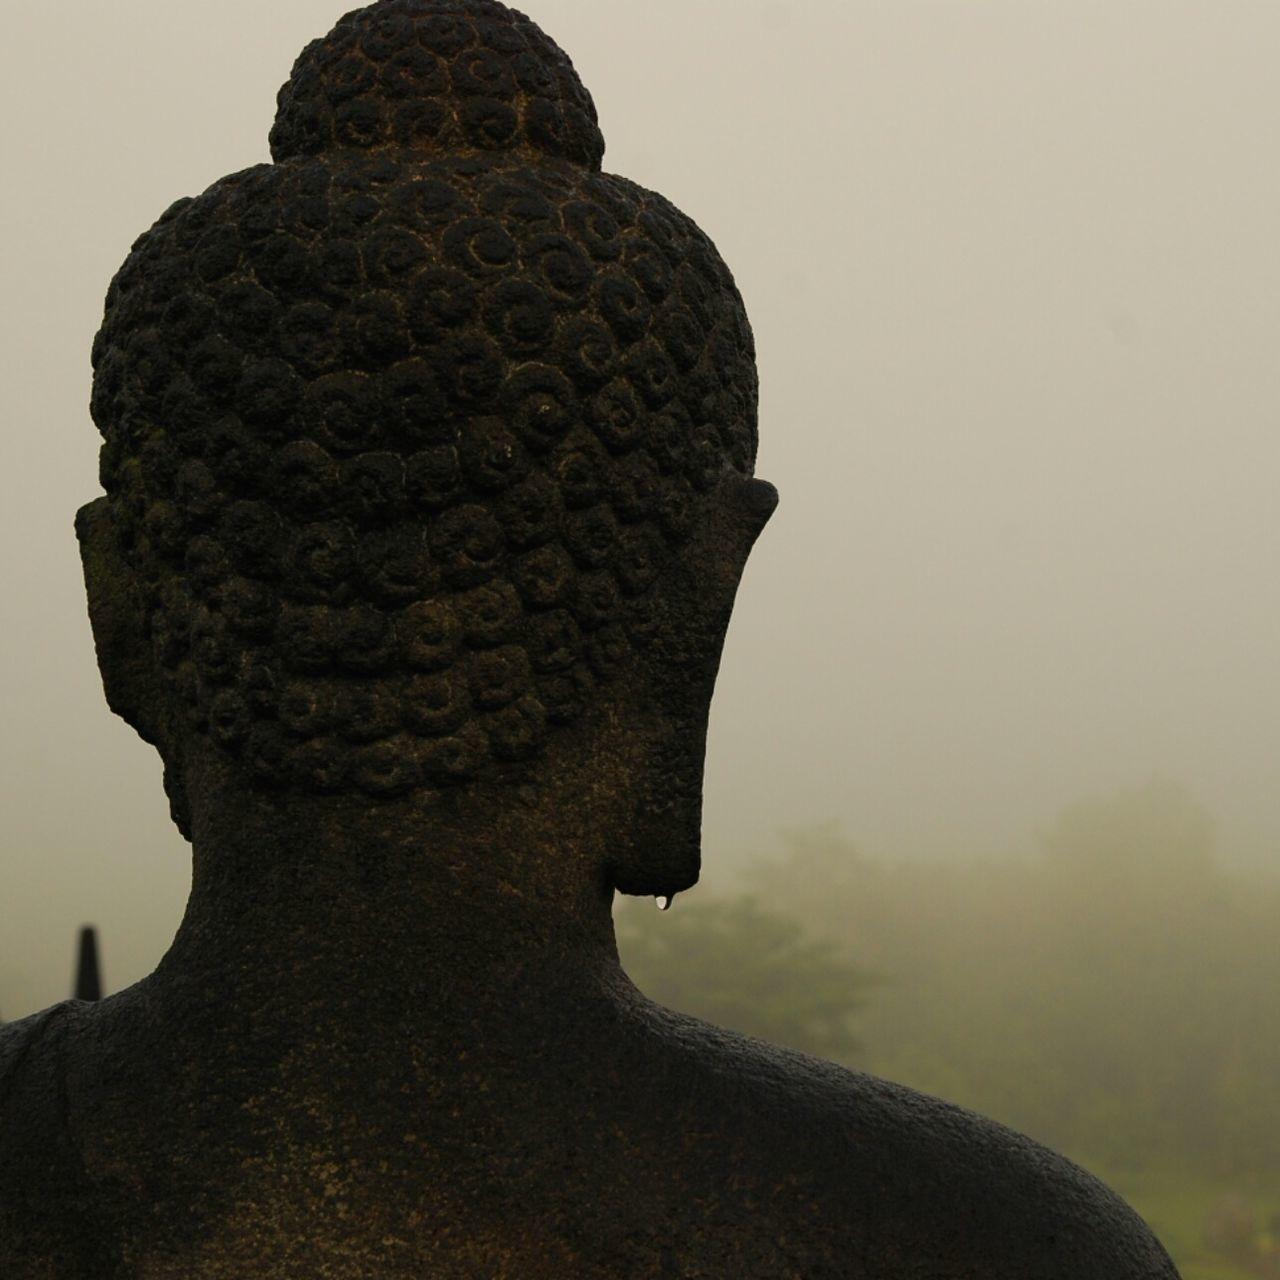 Close-Up Of Buddha Statue At Borobudur During Foggy Weather